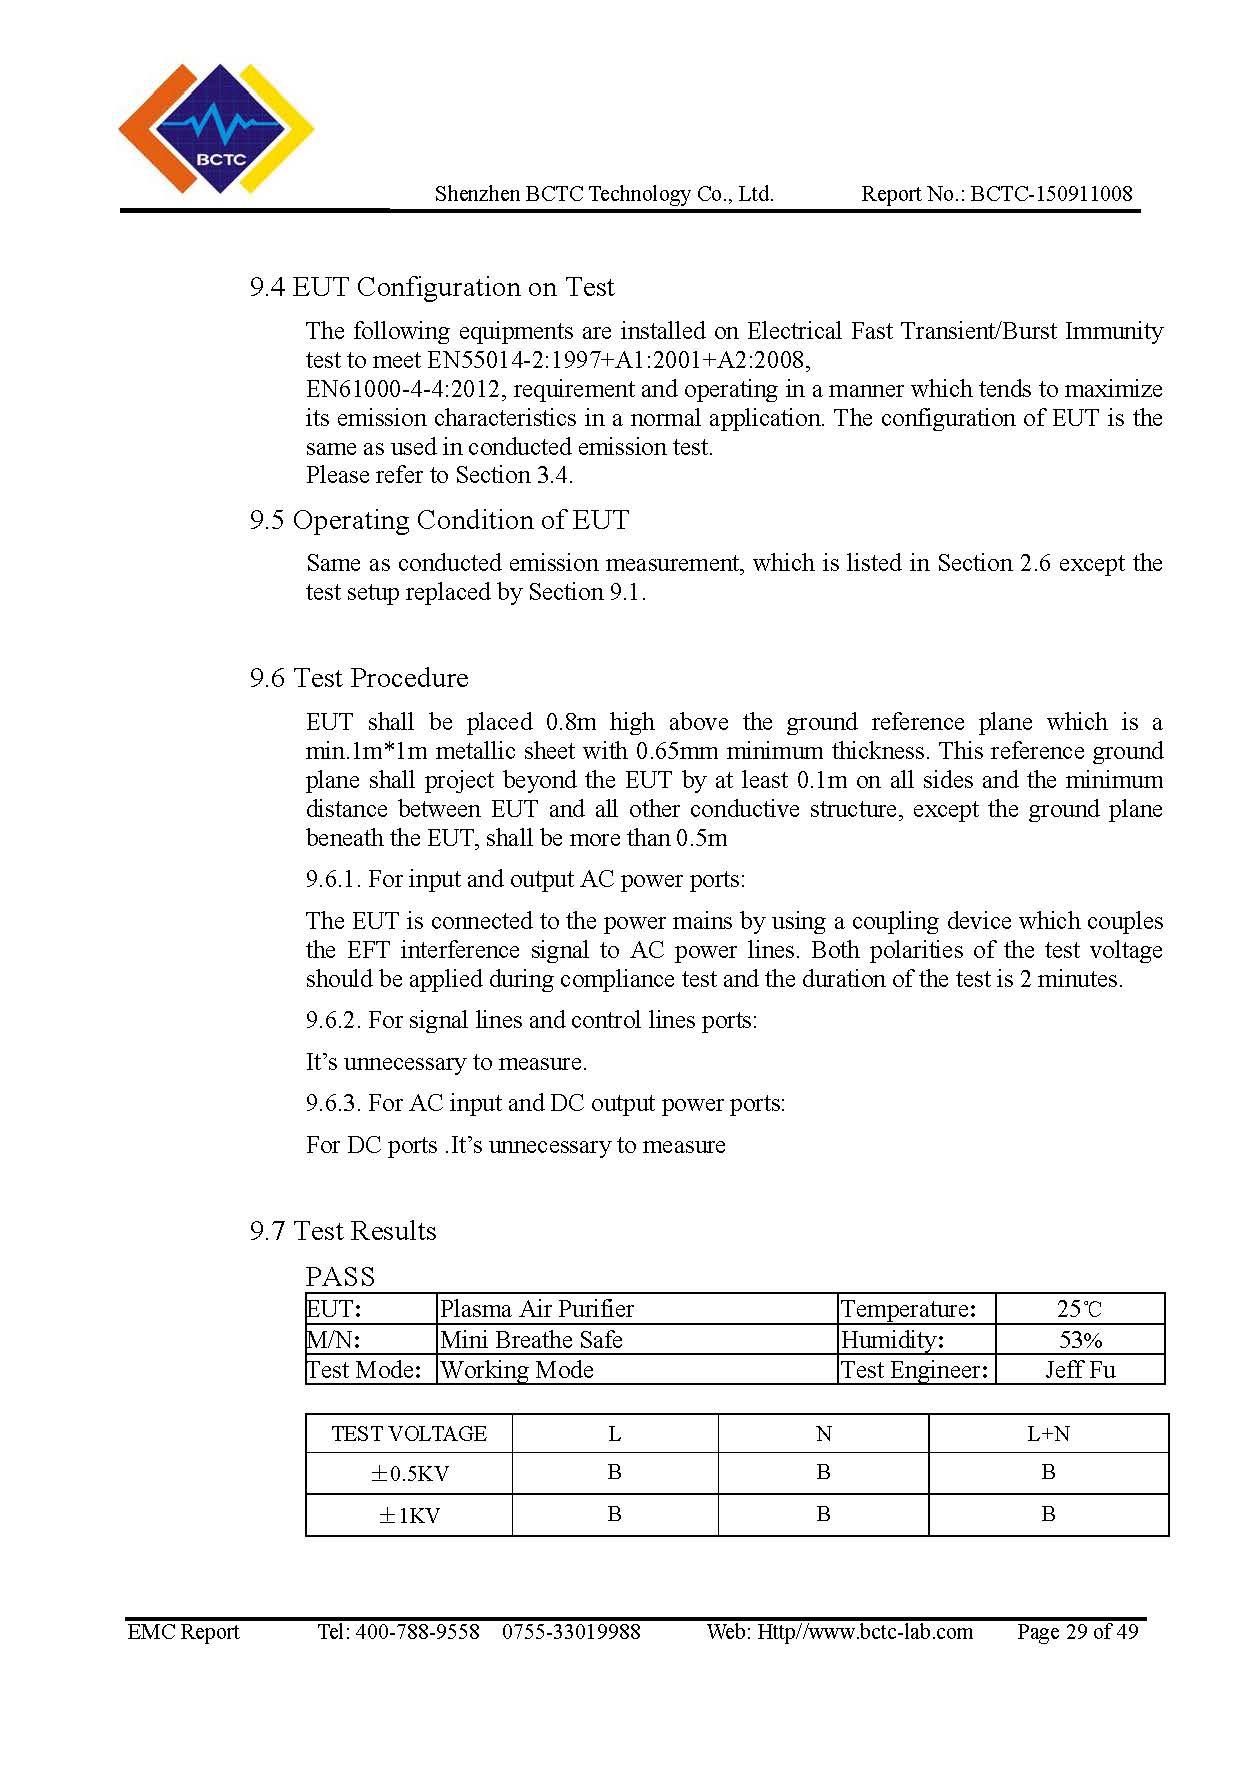 breathe-safe-ce-report-page-29.jpg